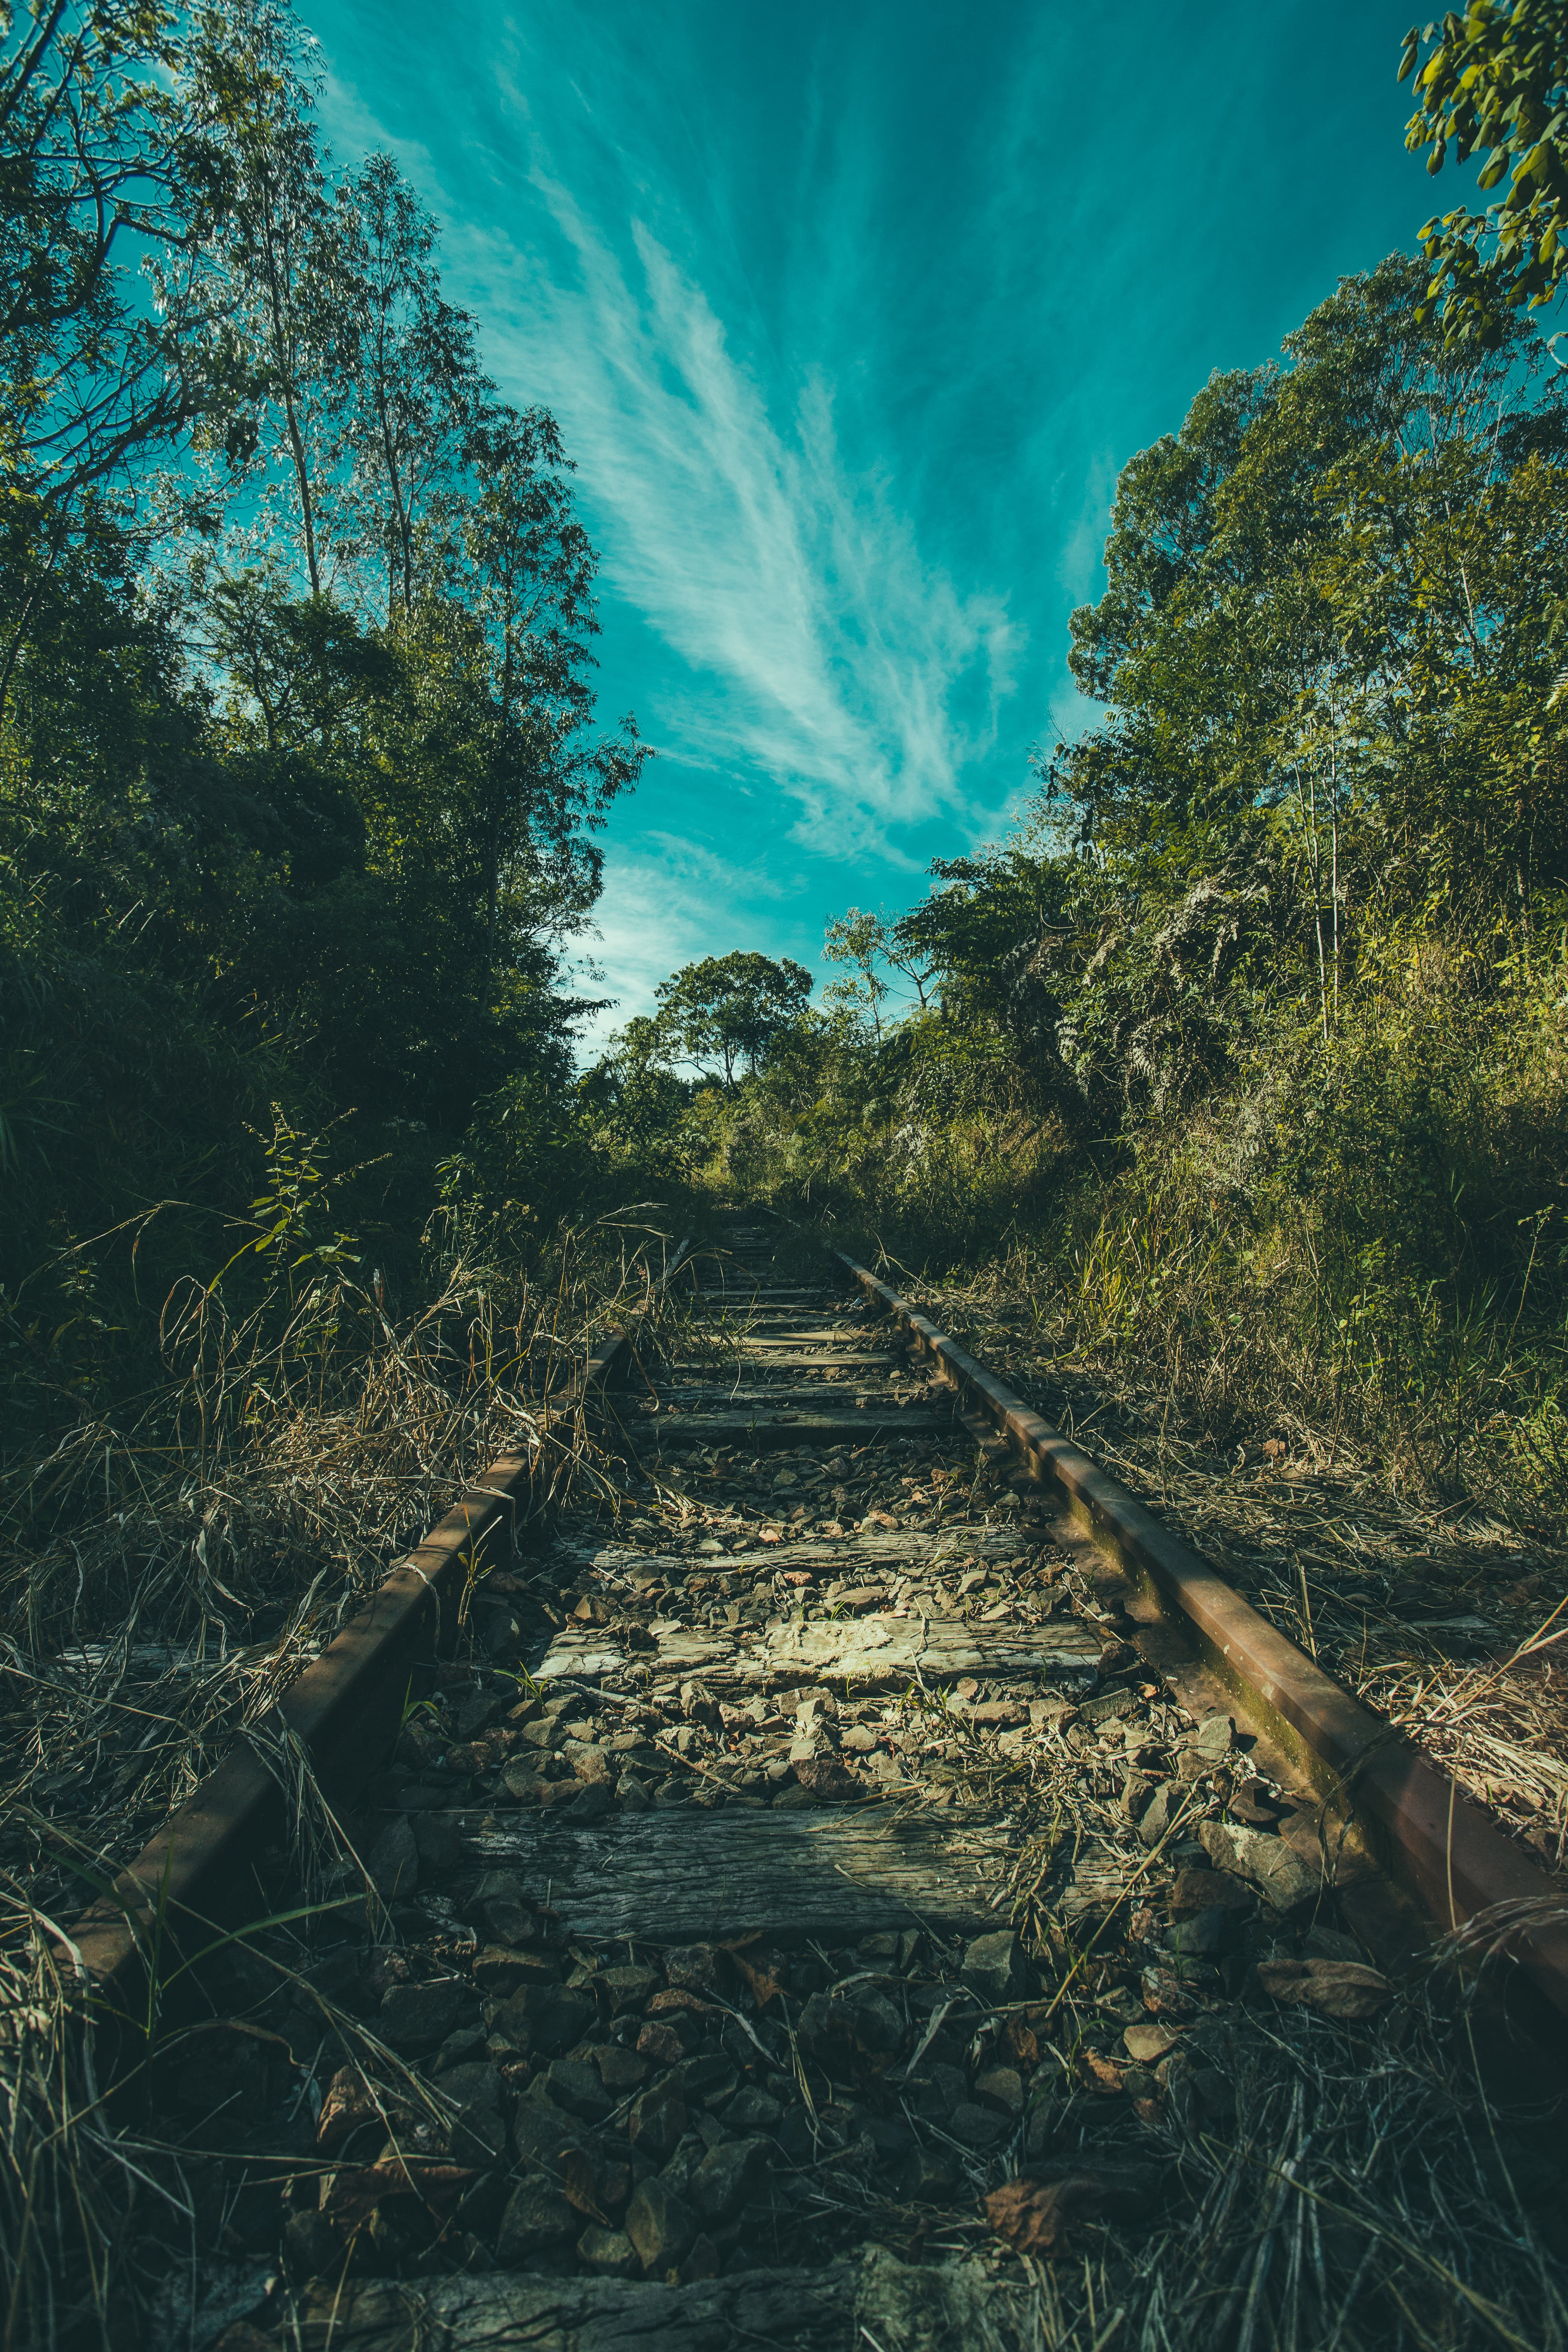 Kostenloses Stock Foto zu bäume, eisenbahn, felsen, gras